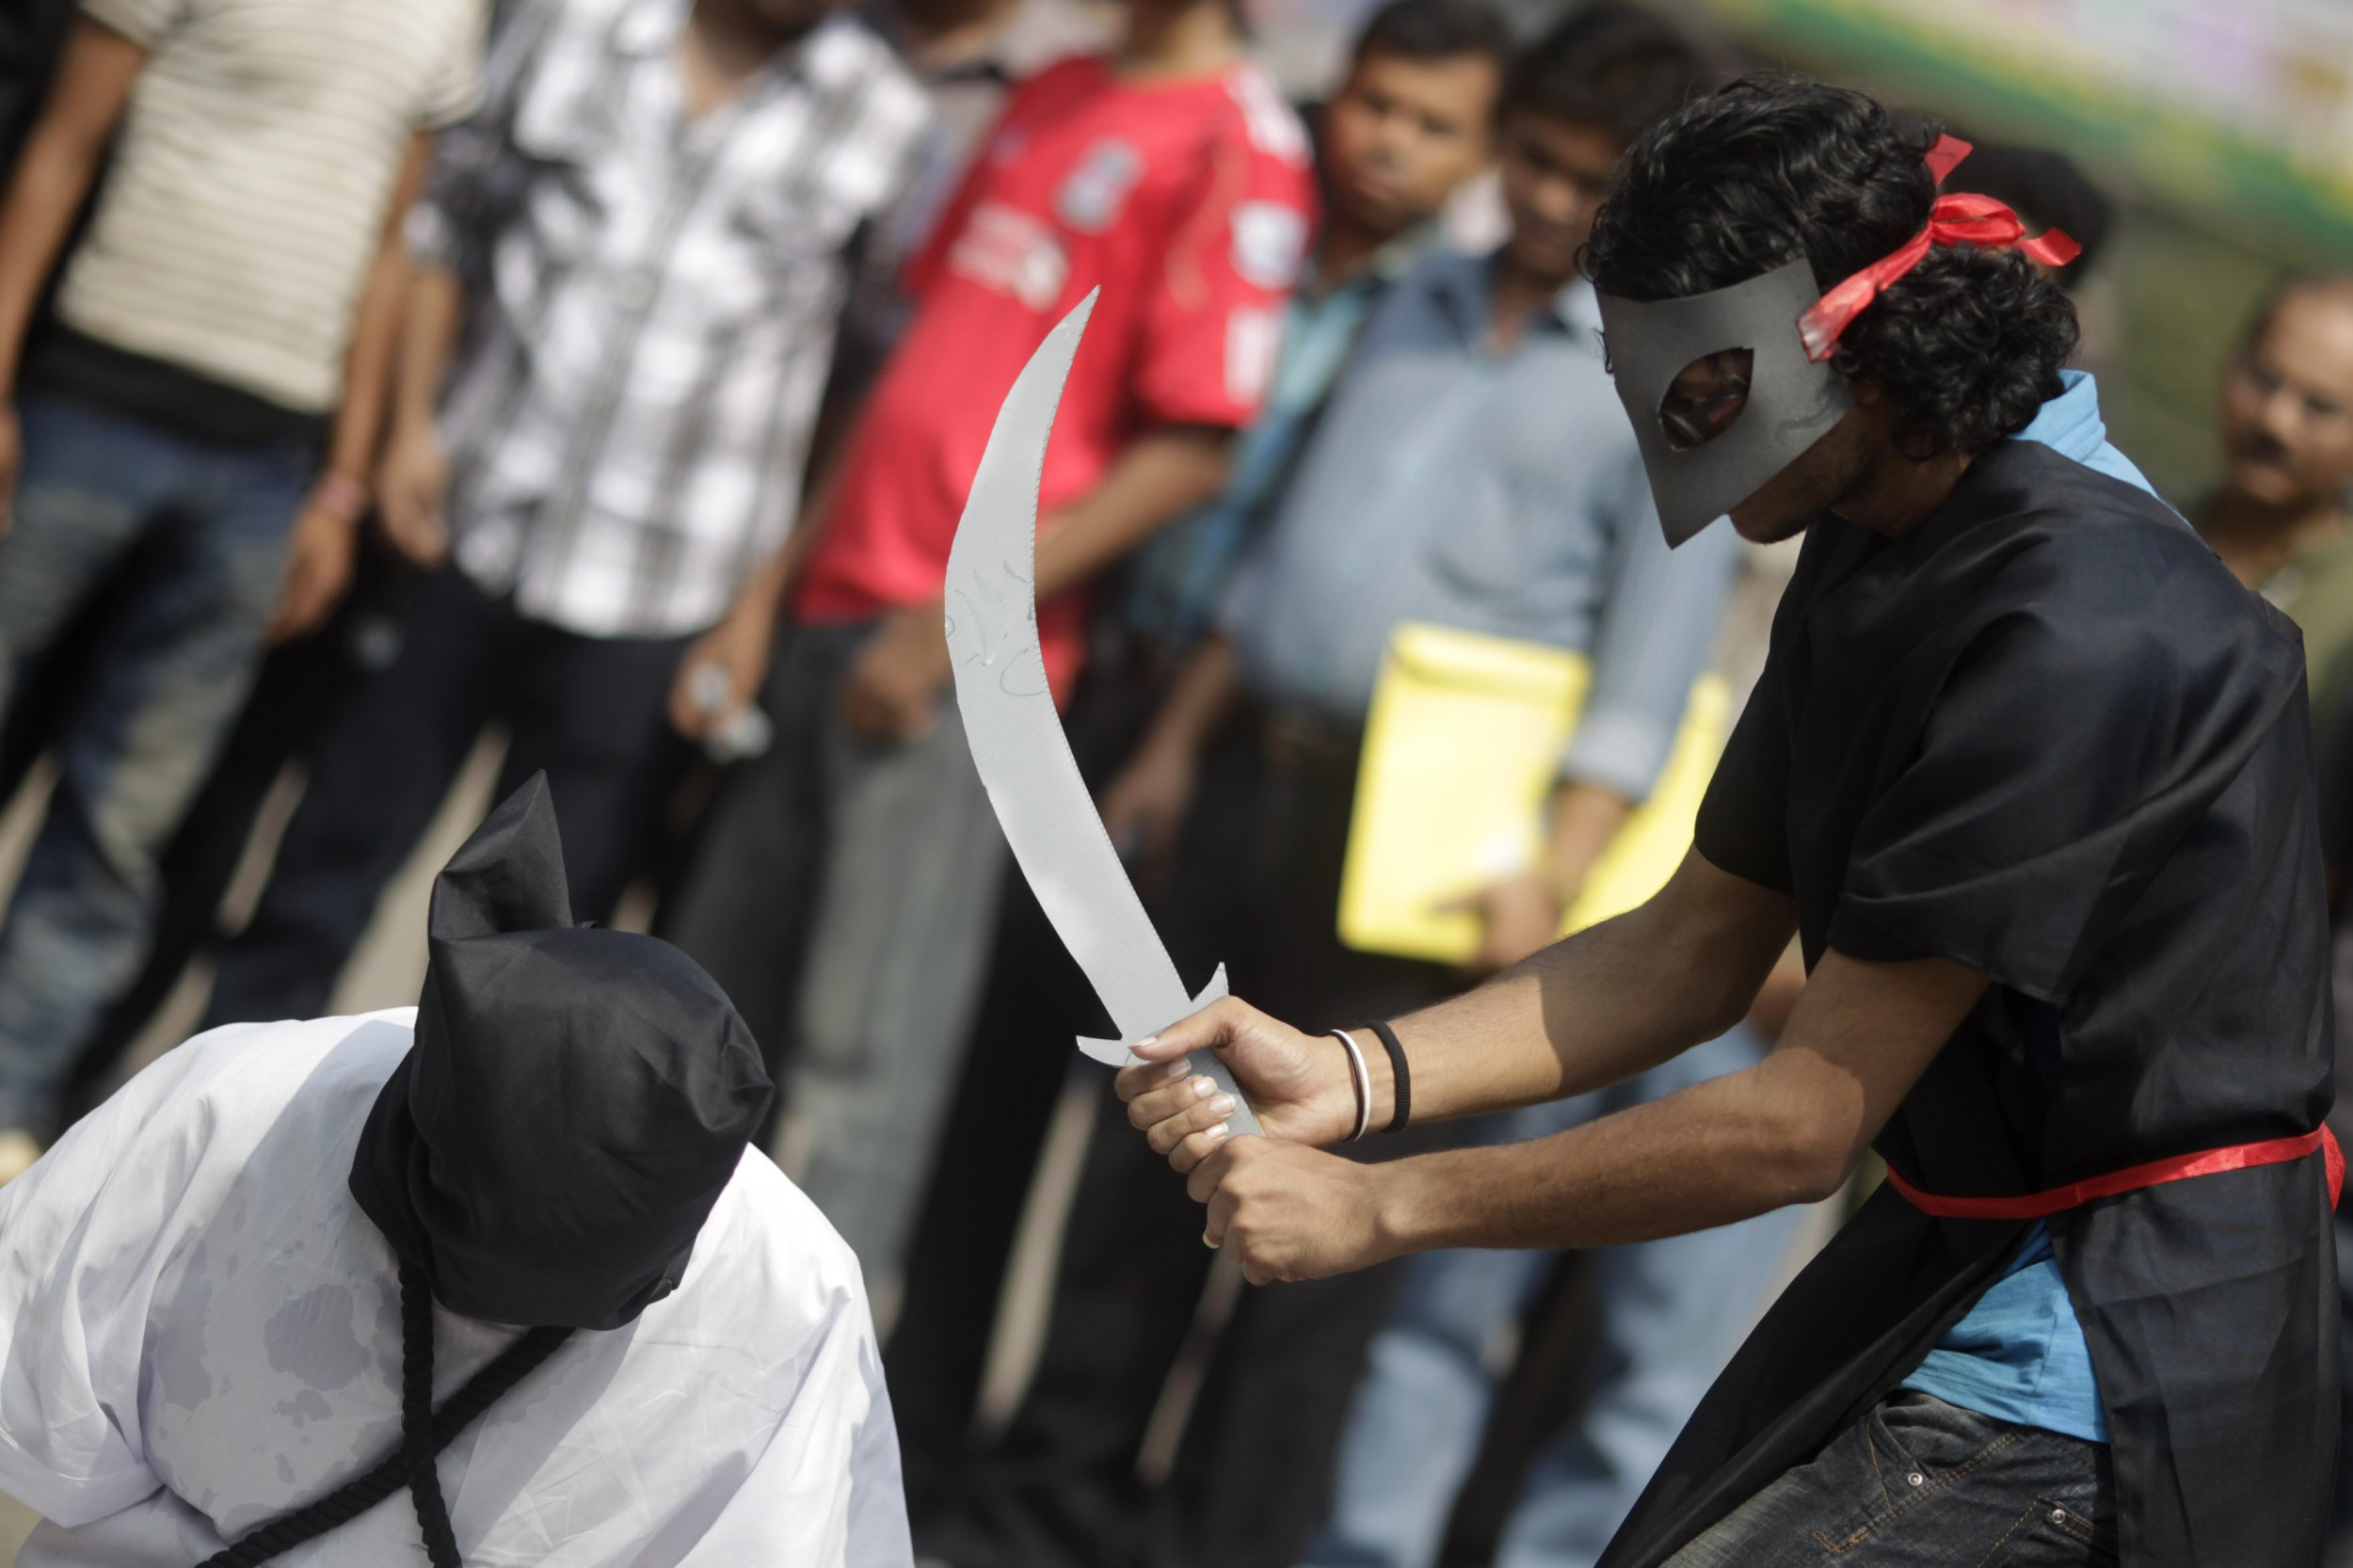 Who Was the Executed Saudi Prince Turki Bin Saud Al-Kabir?